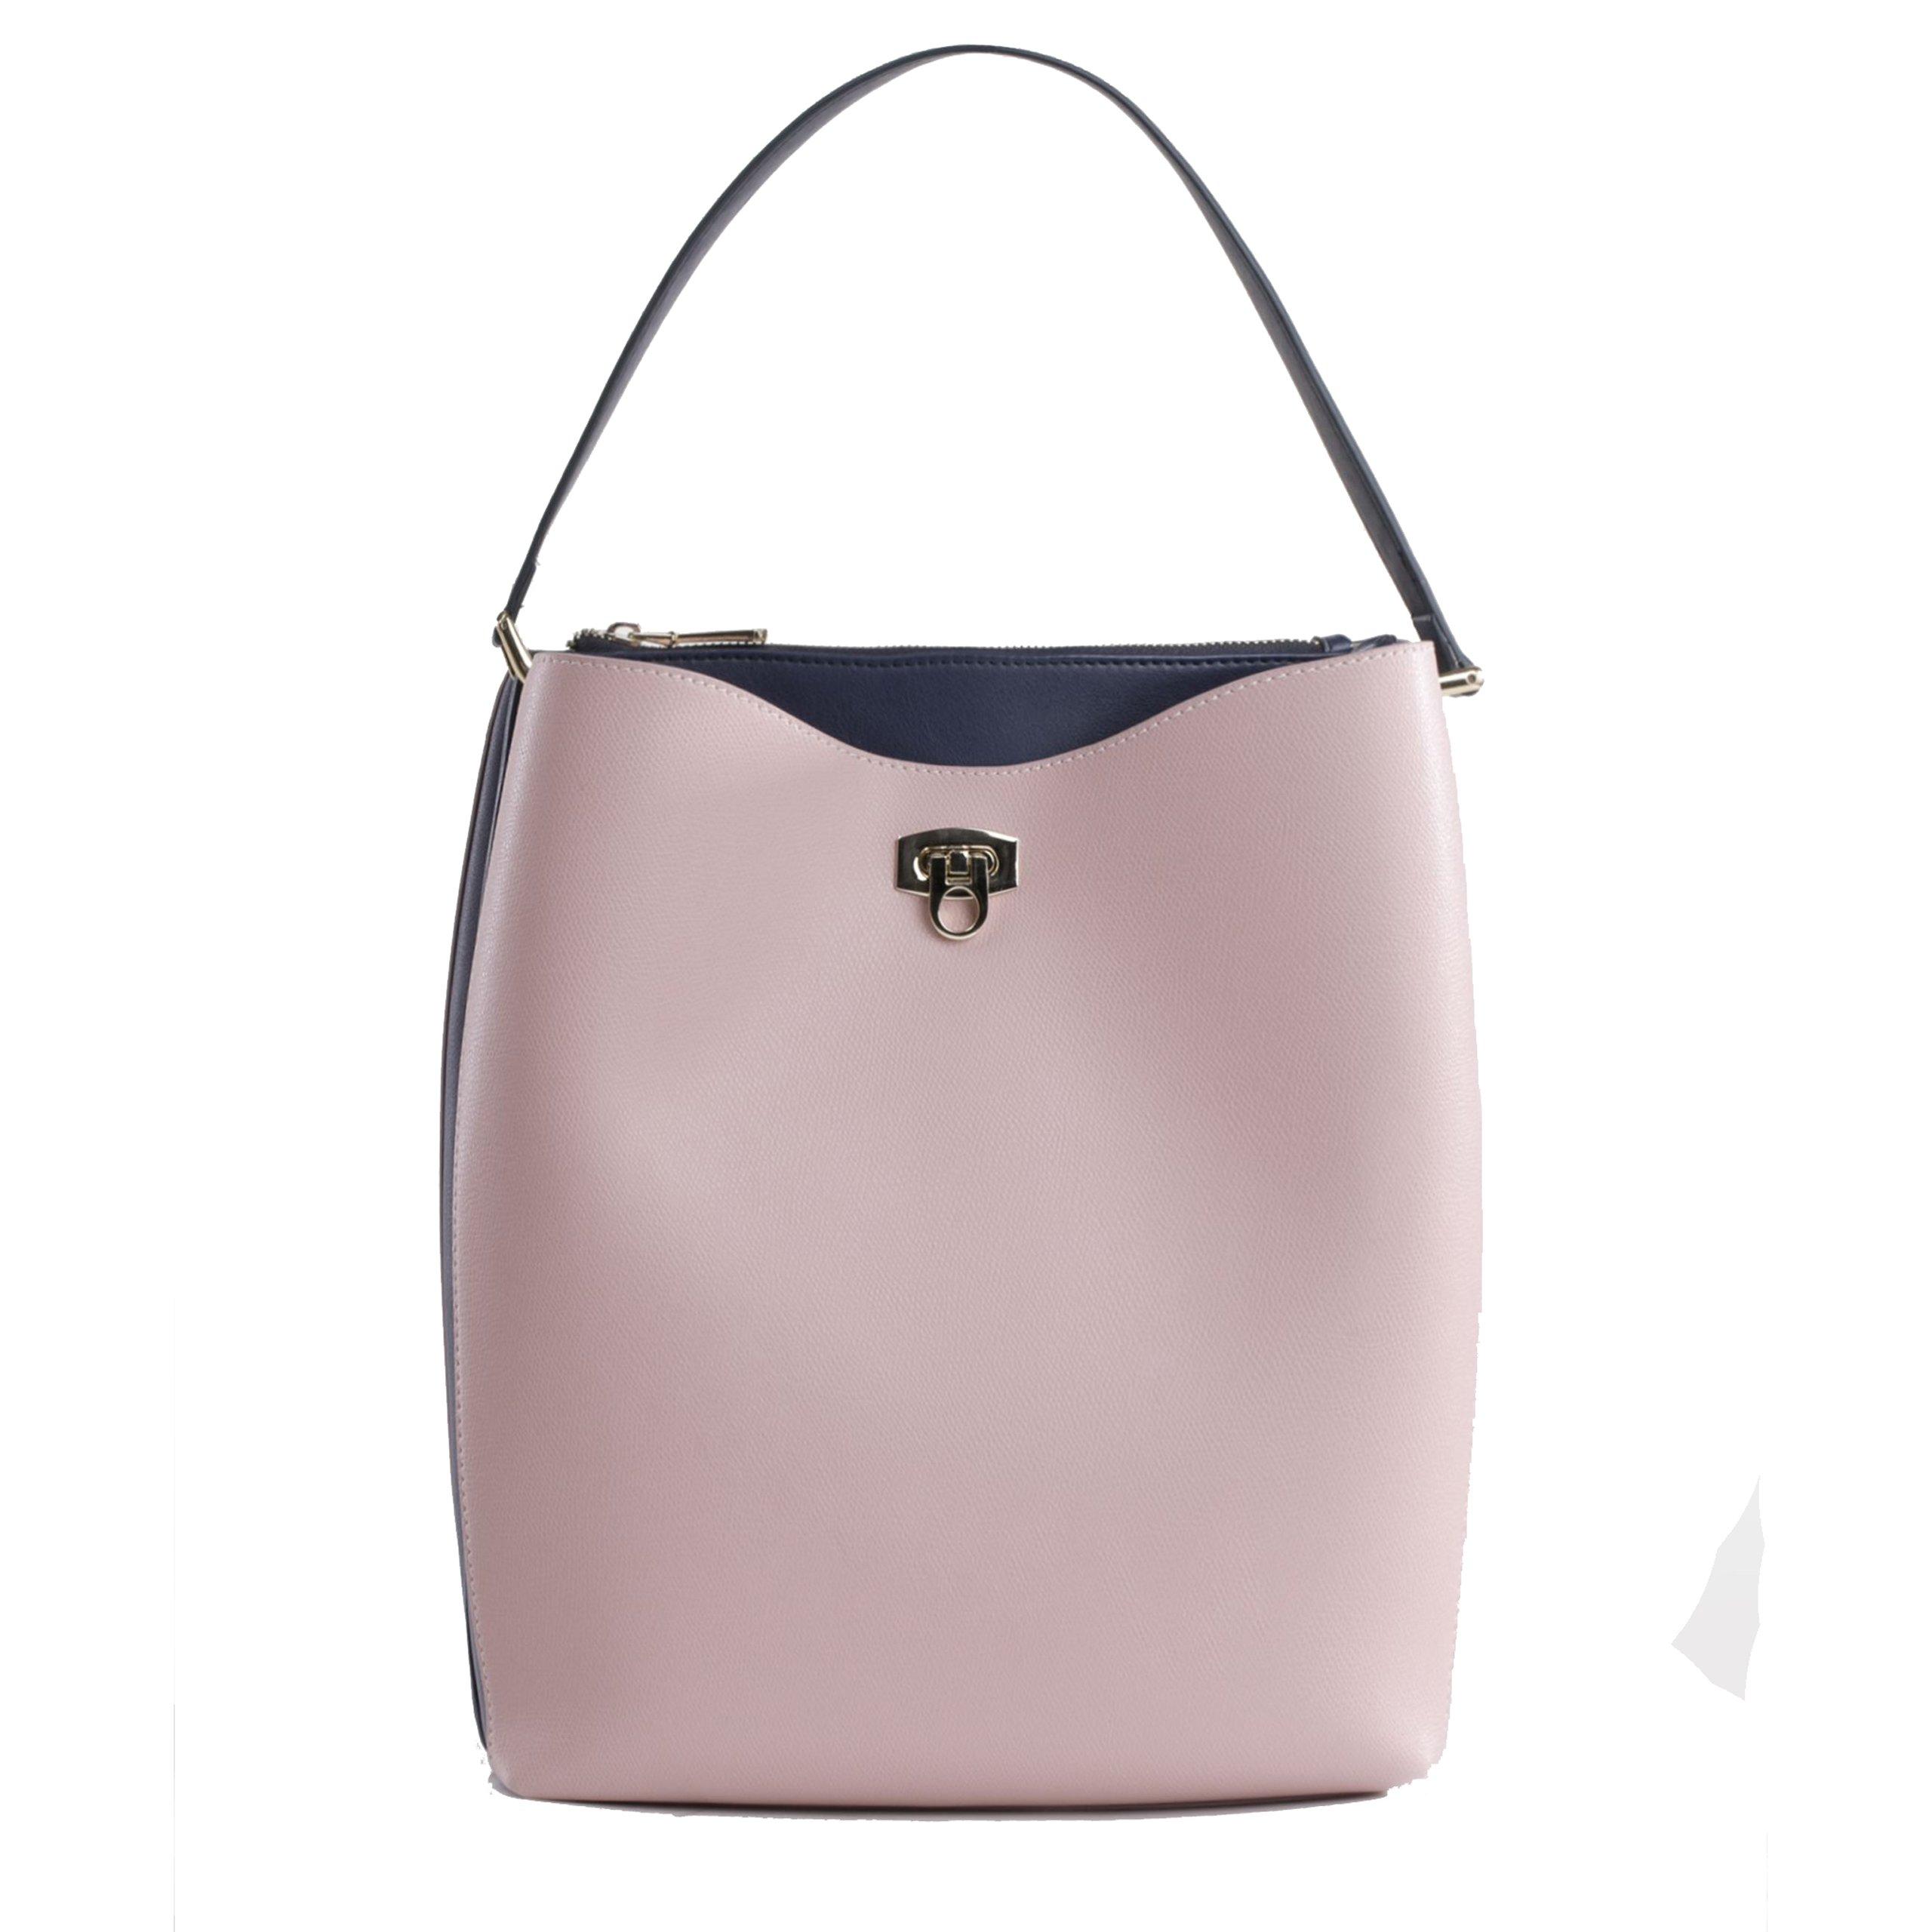 4024850b73287 Torebka Monnari Shopper Bag 7230 PROMOCJA - 7245782544 - oficjalne ...